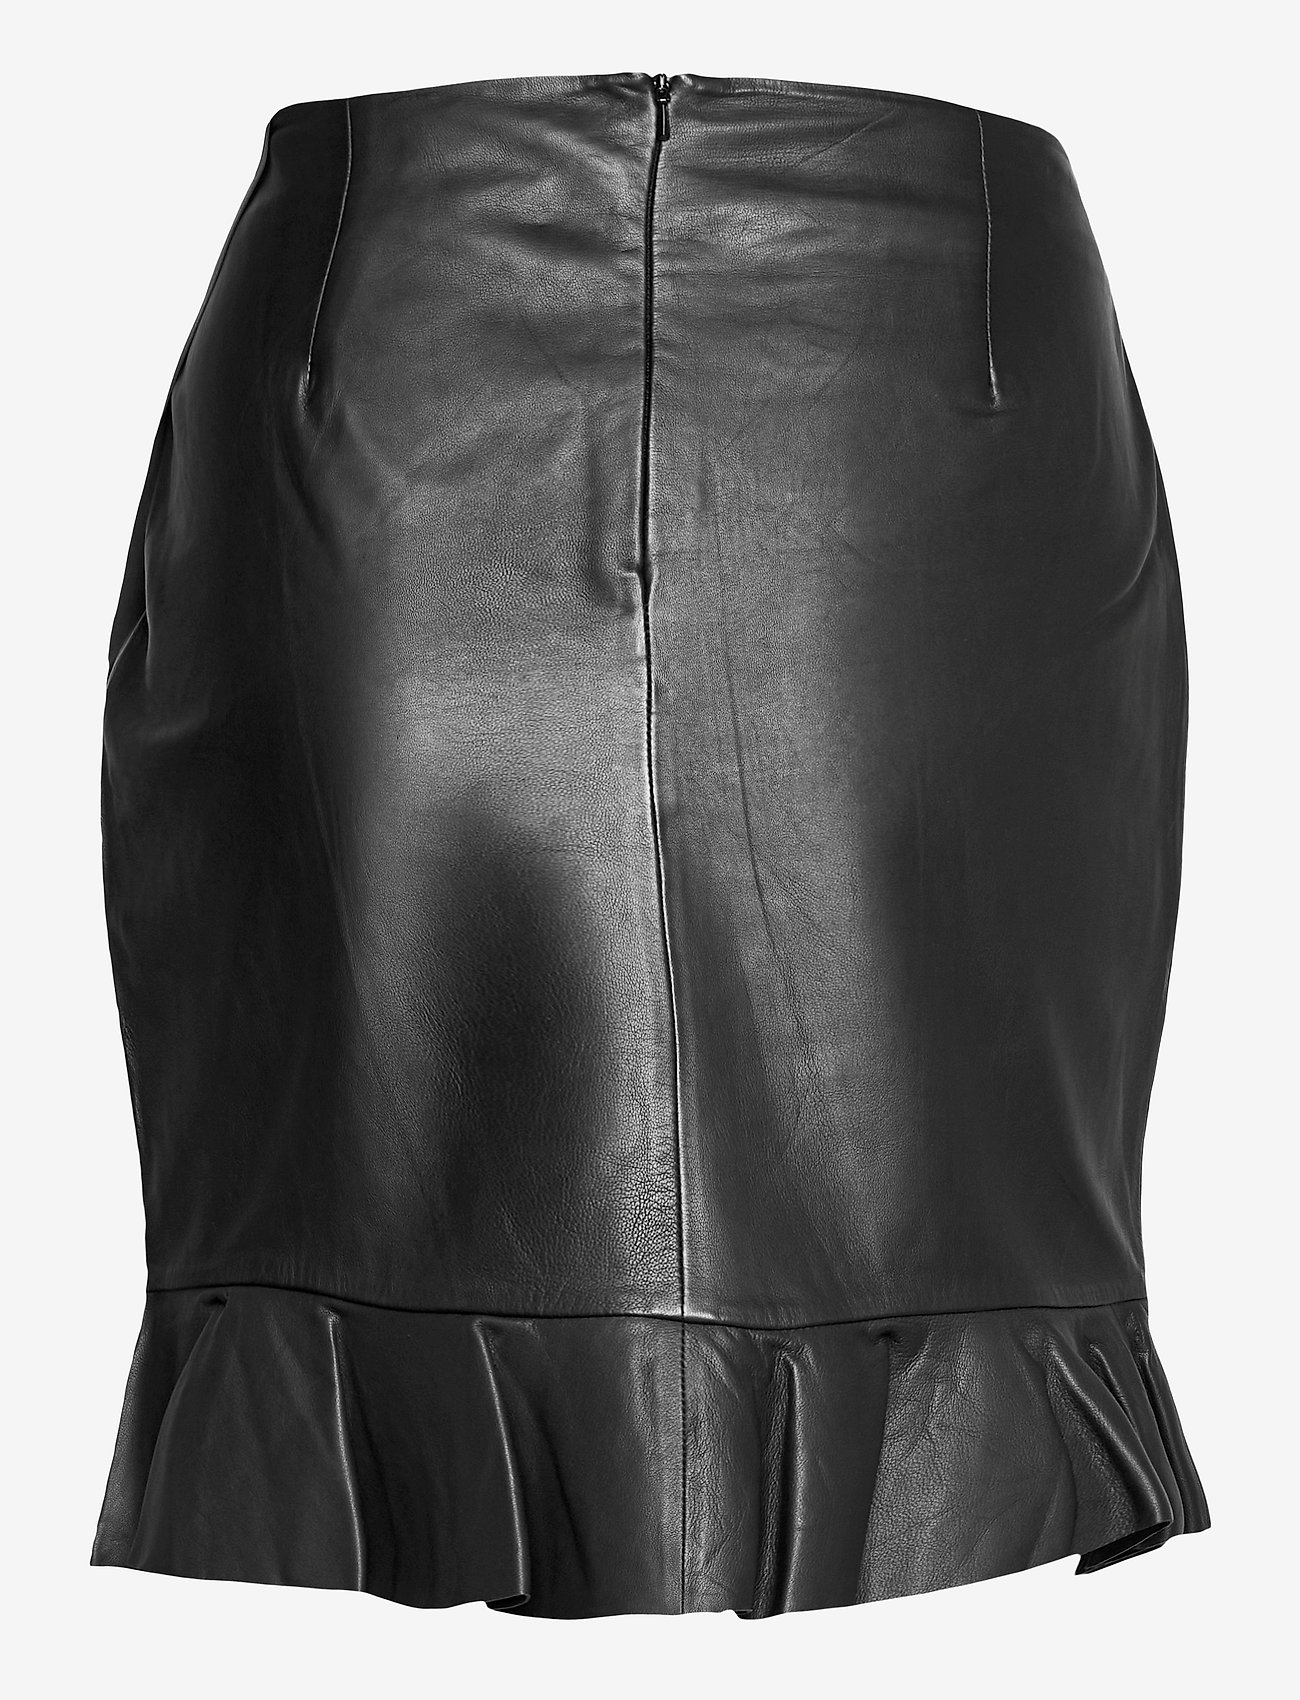 2NDDAY - 2ND Sprucia - short skirts - black - 1